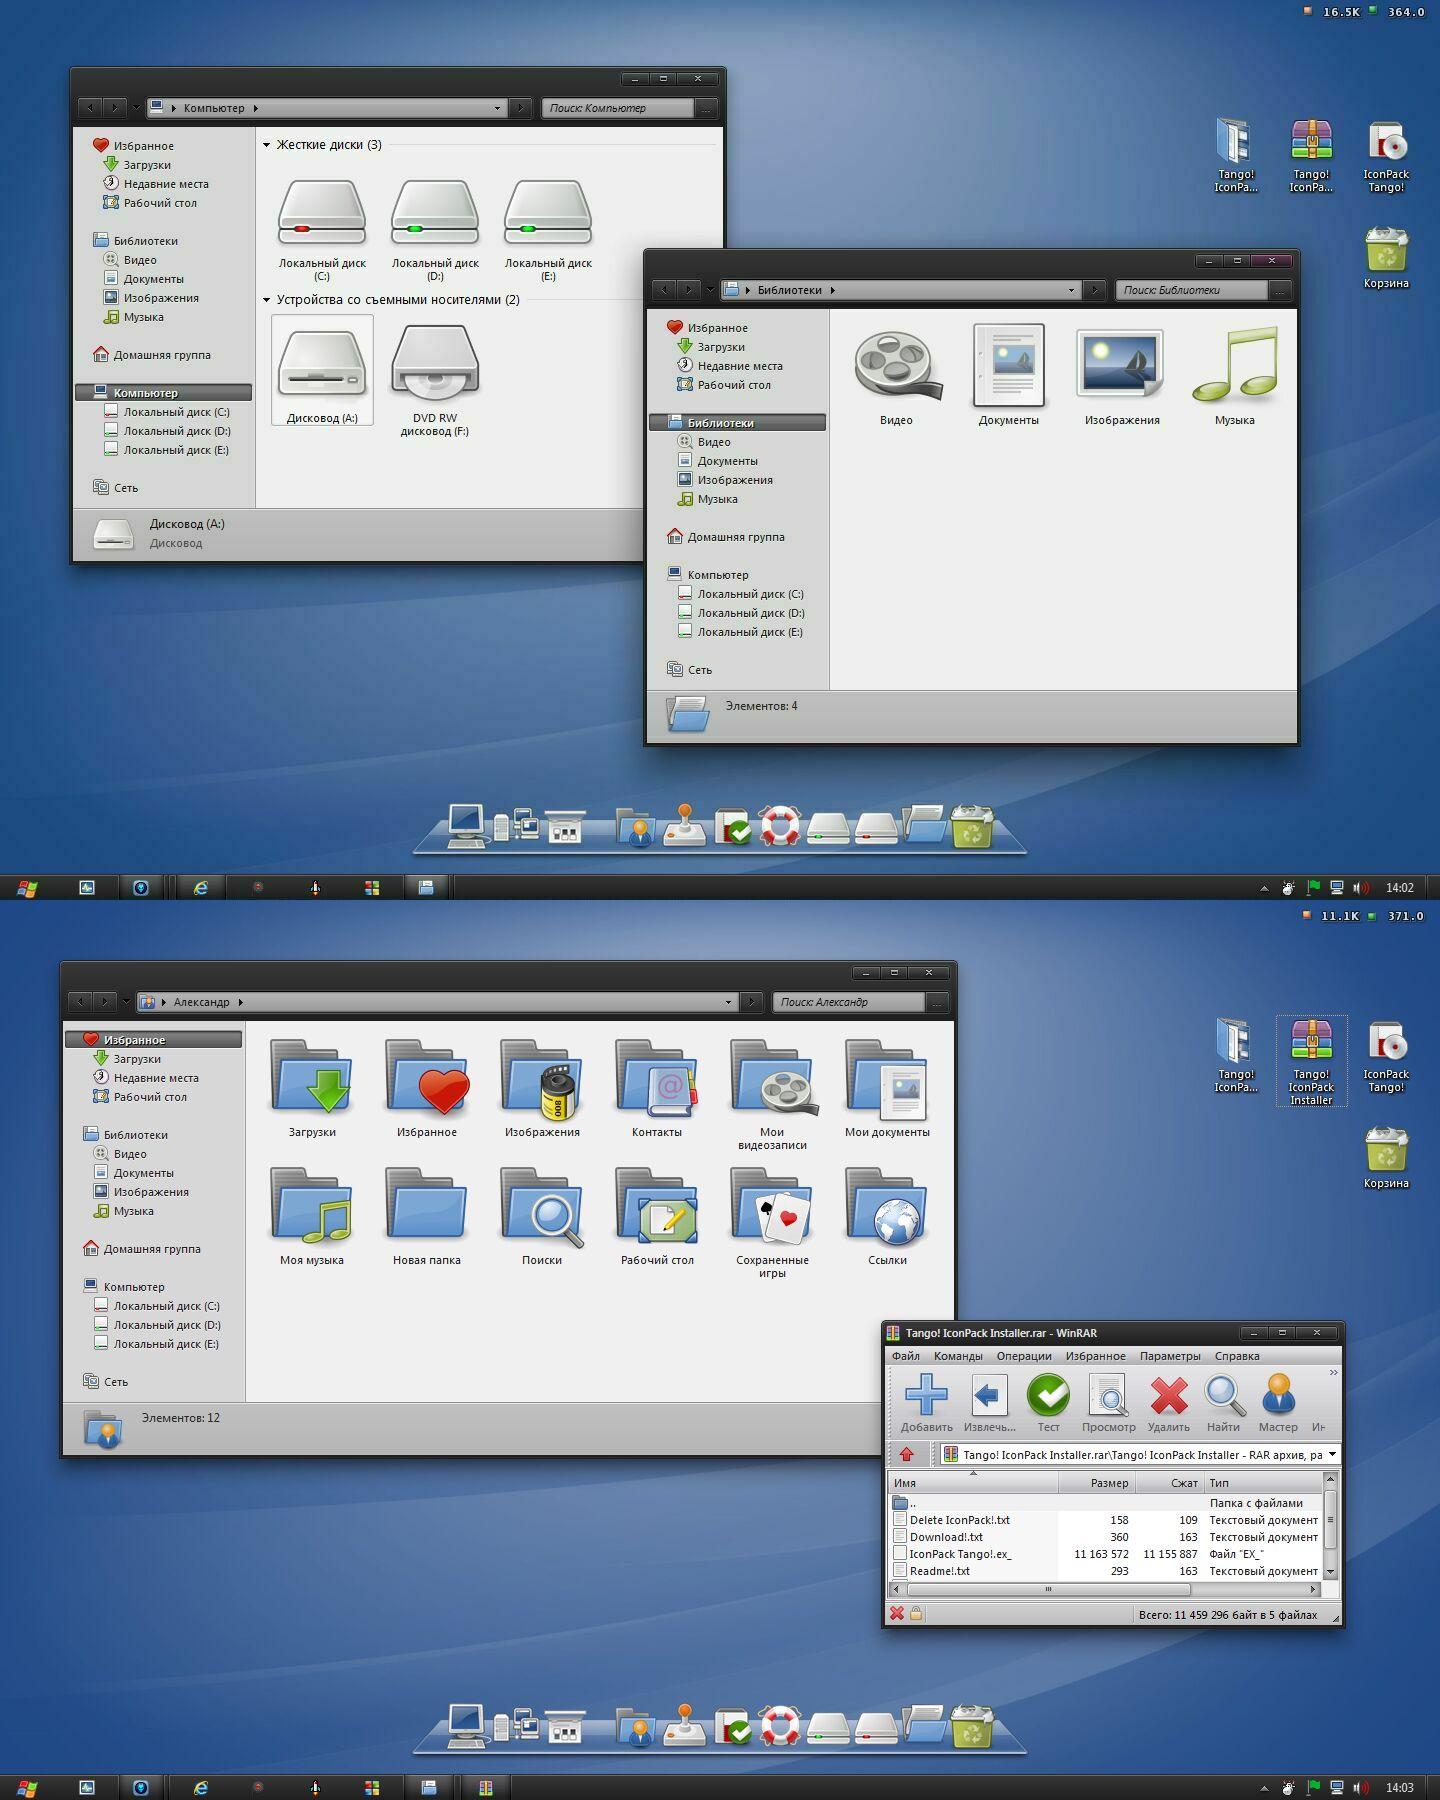 http://orig08.deviantart.net/1073/f/2015/107/a/d/tango__iconpack_installer_by_alexgal23-d8pzzhn.jpg